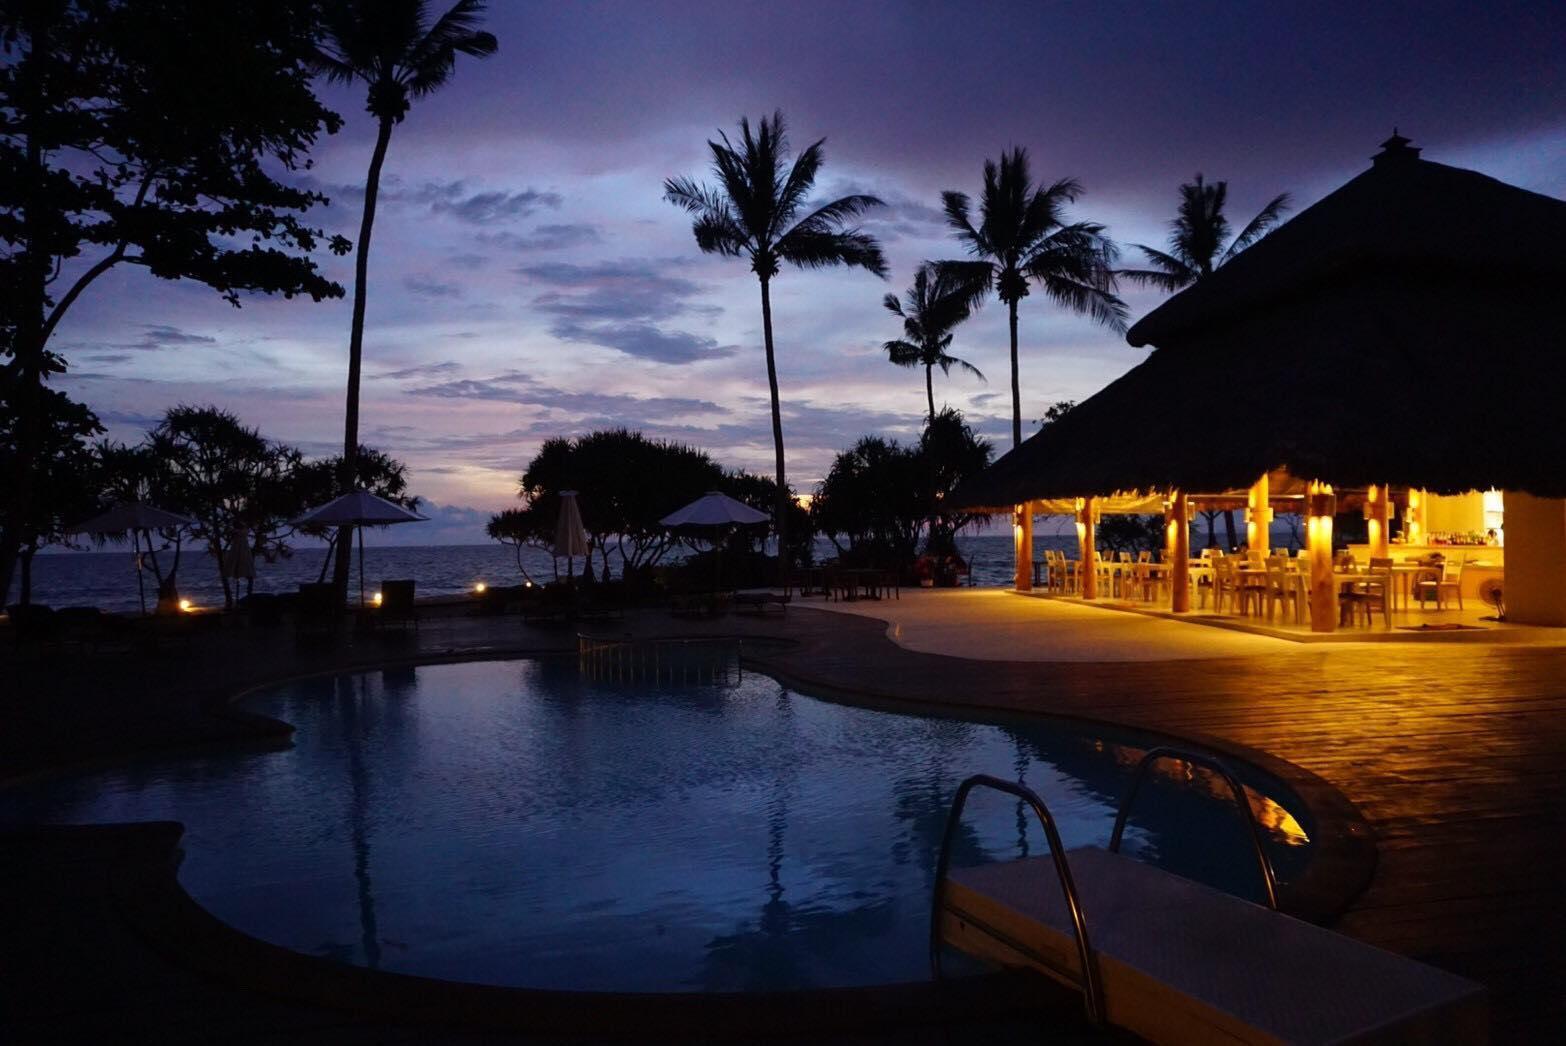 Moonlight Exotic Bay Resort มูนไลท์ เอ็กโซติก เบย์ รีสอร์ท